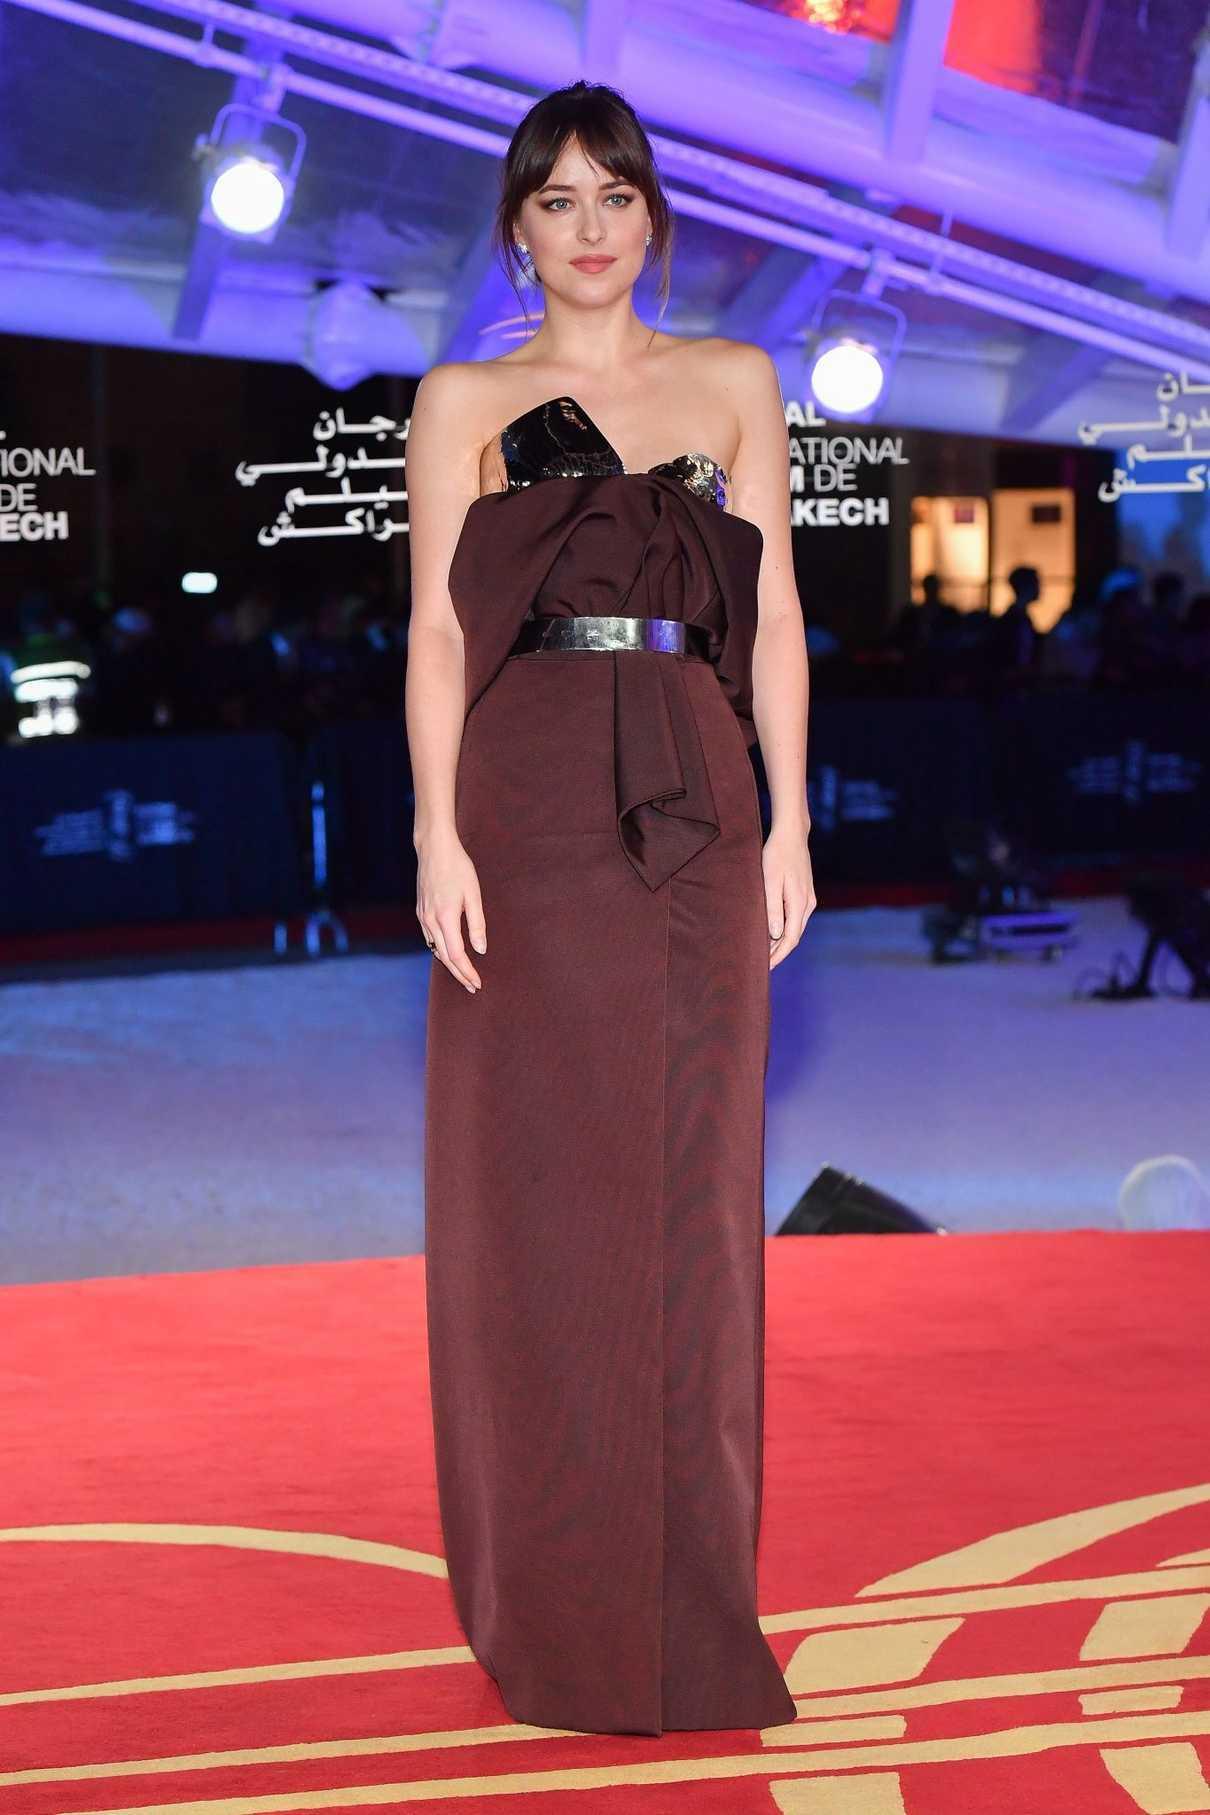 Dakota Johnson Attends Robert De Niro Tribute During 2018 Marrakech International Film Festival in Marrakech 12/01/2018